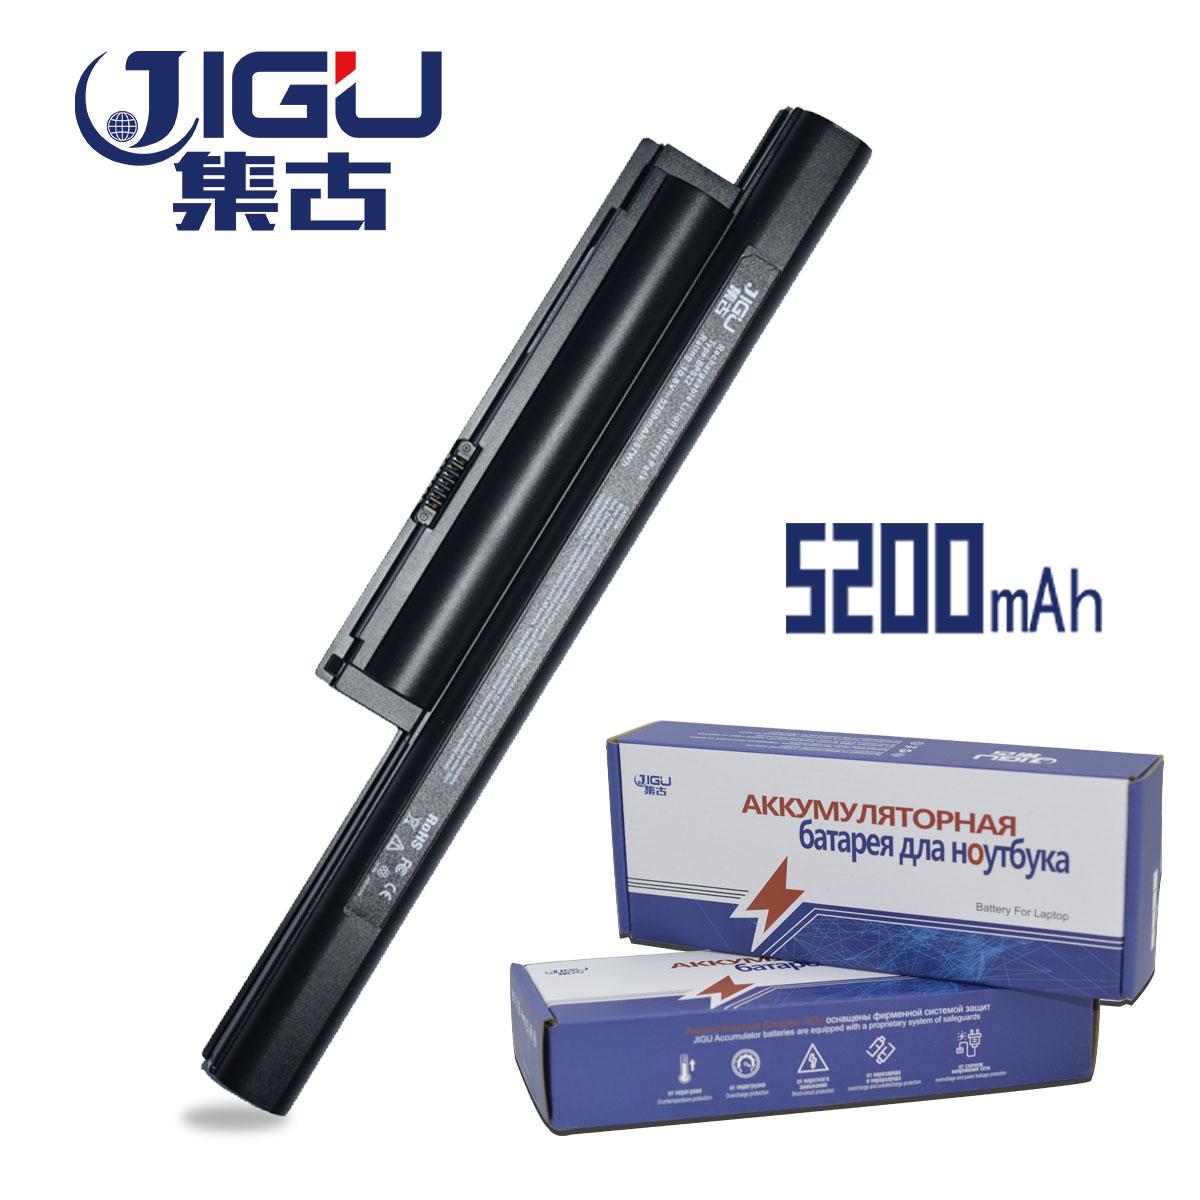 JIGU Battery For SONY BPS22 VGP-BPS22 VGP-BPS22A For VAIO VPC-E1Z1E VPC-EA1 EA16E EA1S EA45FG/B EA1Z1E EA27EC аккумулятор rocknparts для sony vgp bps22 vpc e1 vpc ea vpc eb vpc ec vpc ee vpc ef vpceb20 vpcec20 vpcee20 vpcef20 3500mah 11 1v оригинал 126676